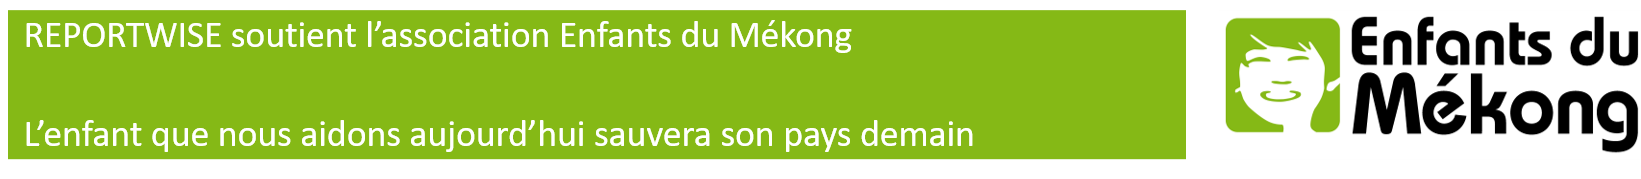 Enfants du Mékong Reportwise